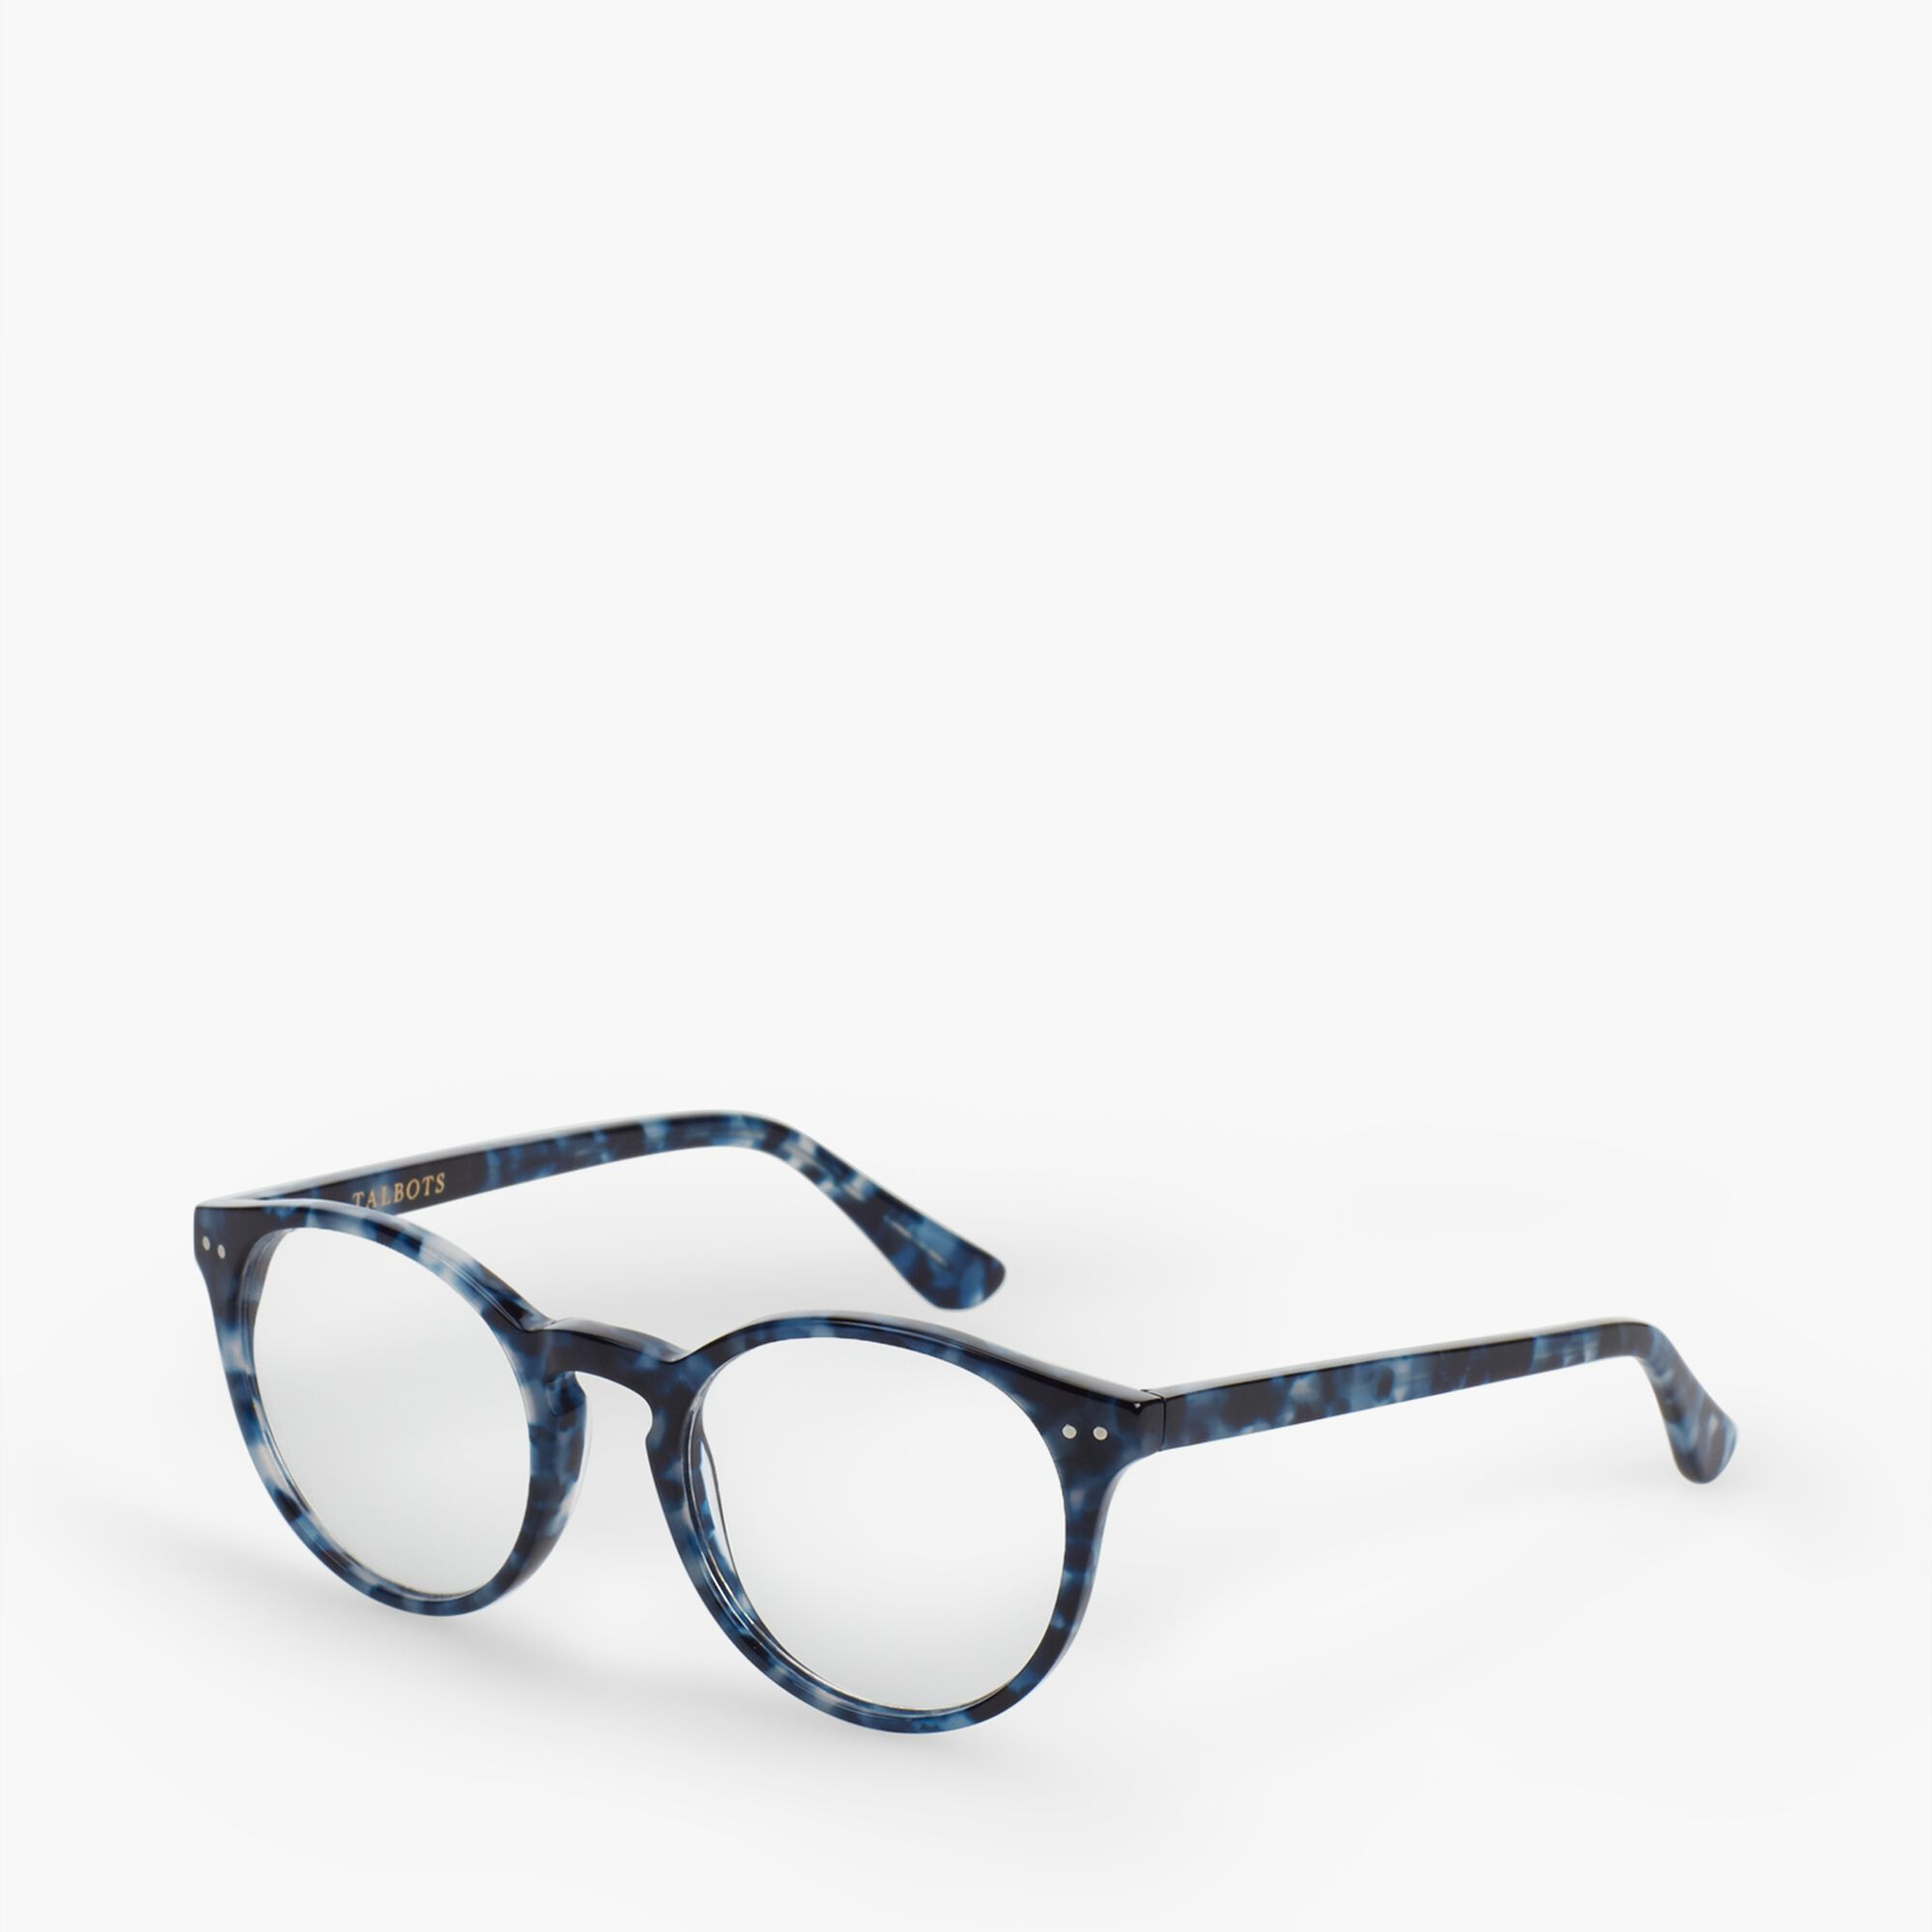 9c36d4c034 Images. Oxford Reading Glasses